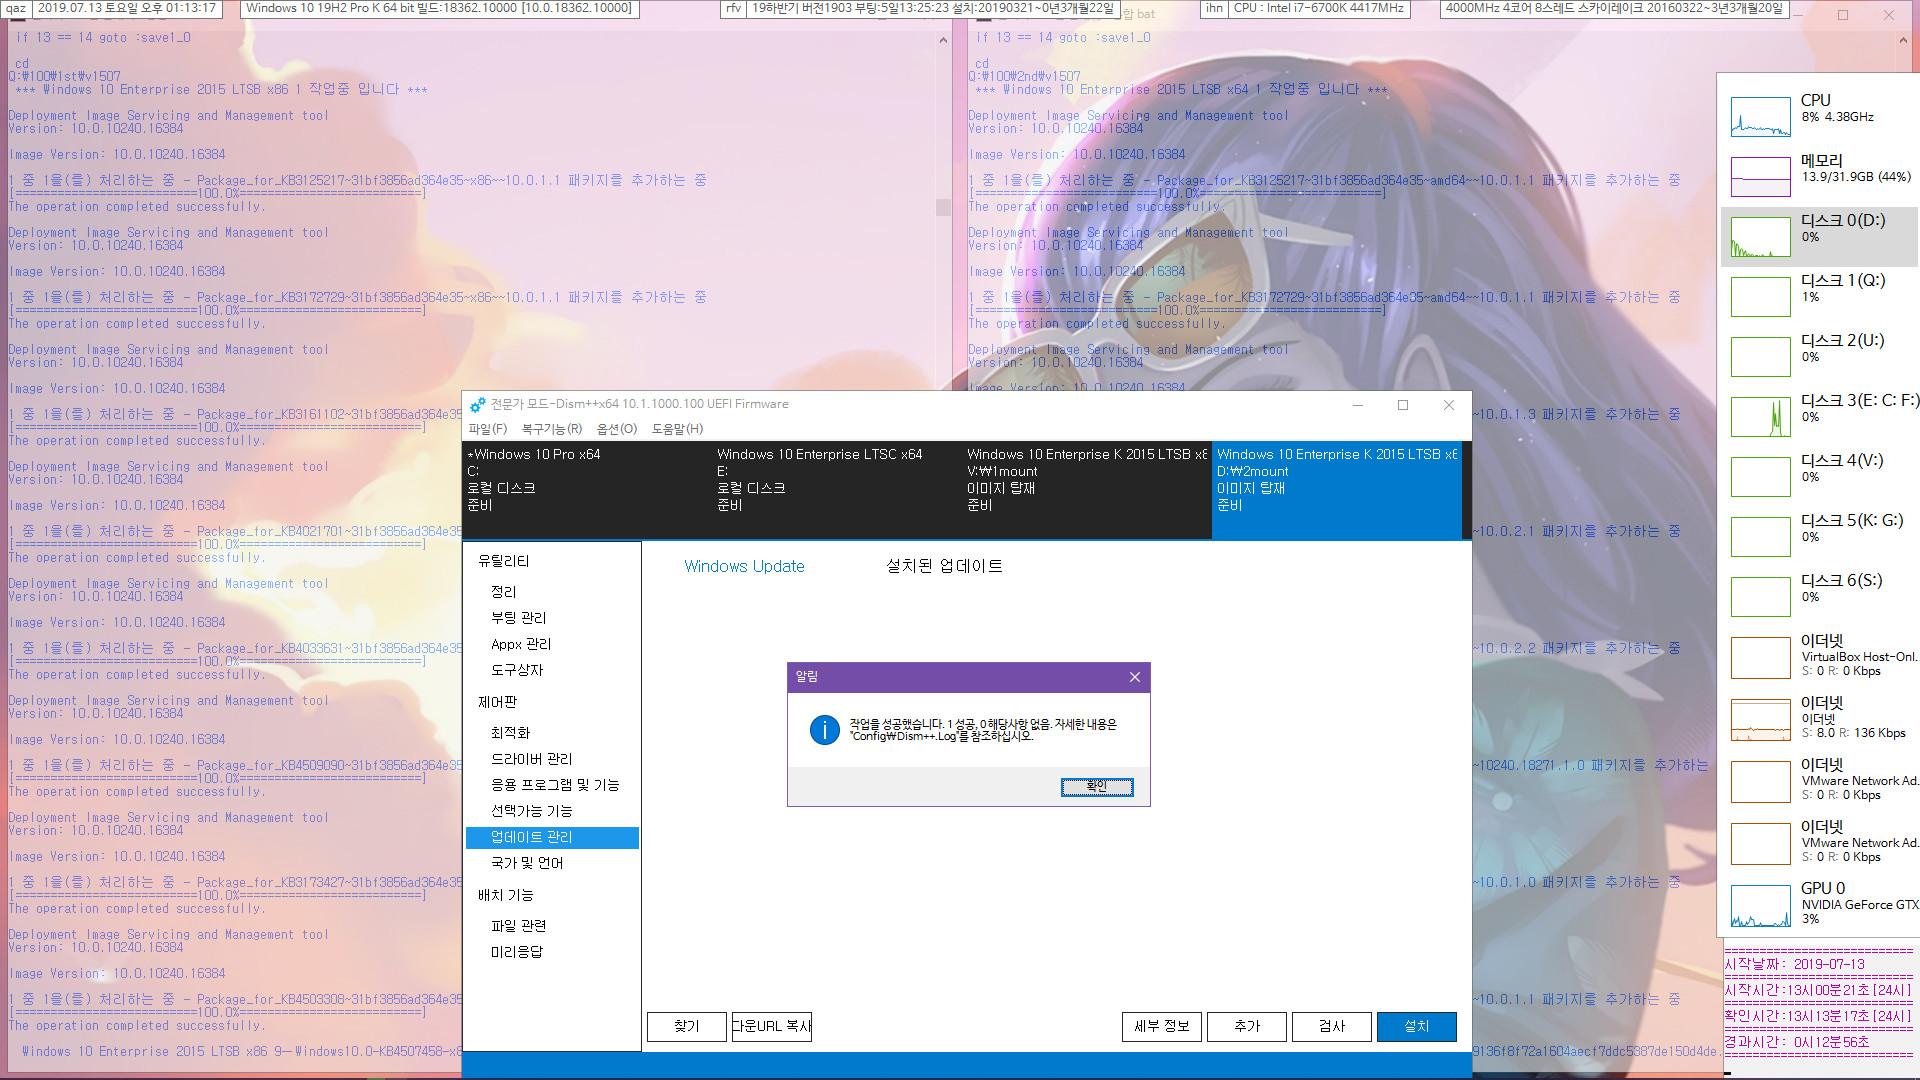 Windows 10 버전 1507 누적 업데이트 KB4507458 (OS 빌드 10240.18275) [2019-07-09 일자] 중에 2015 LTSB 통합중 입니다 2019-07-13_131317.jpg